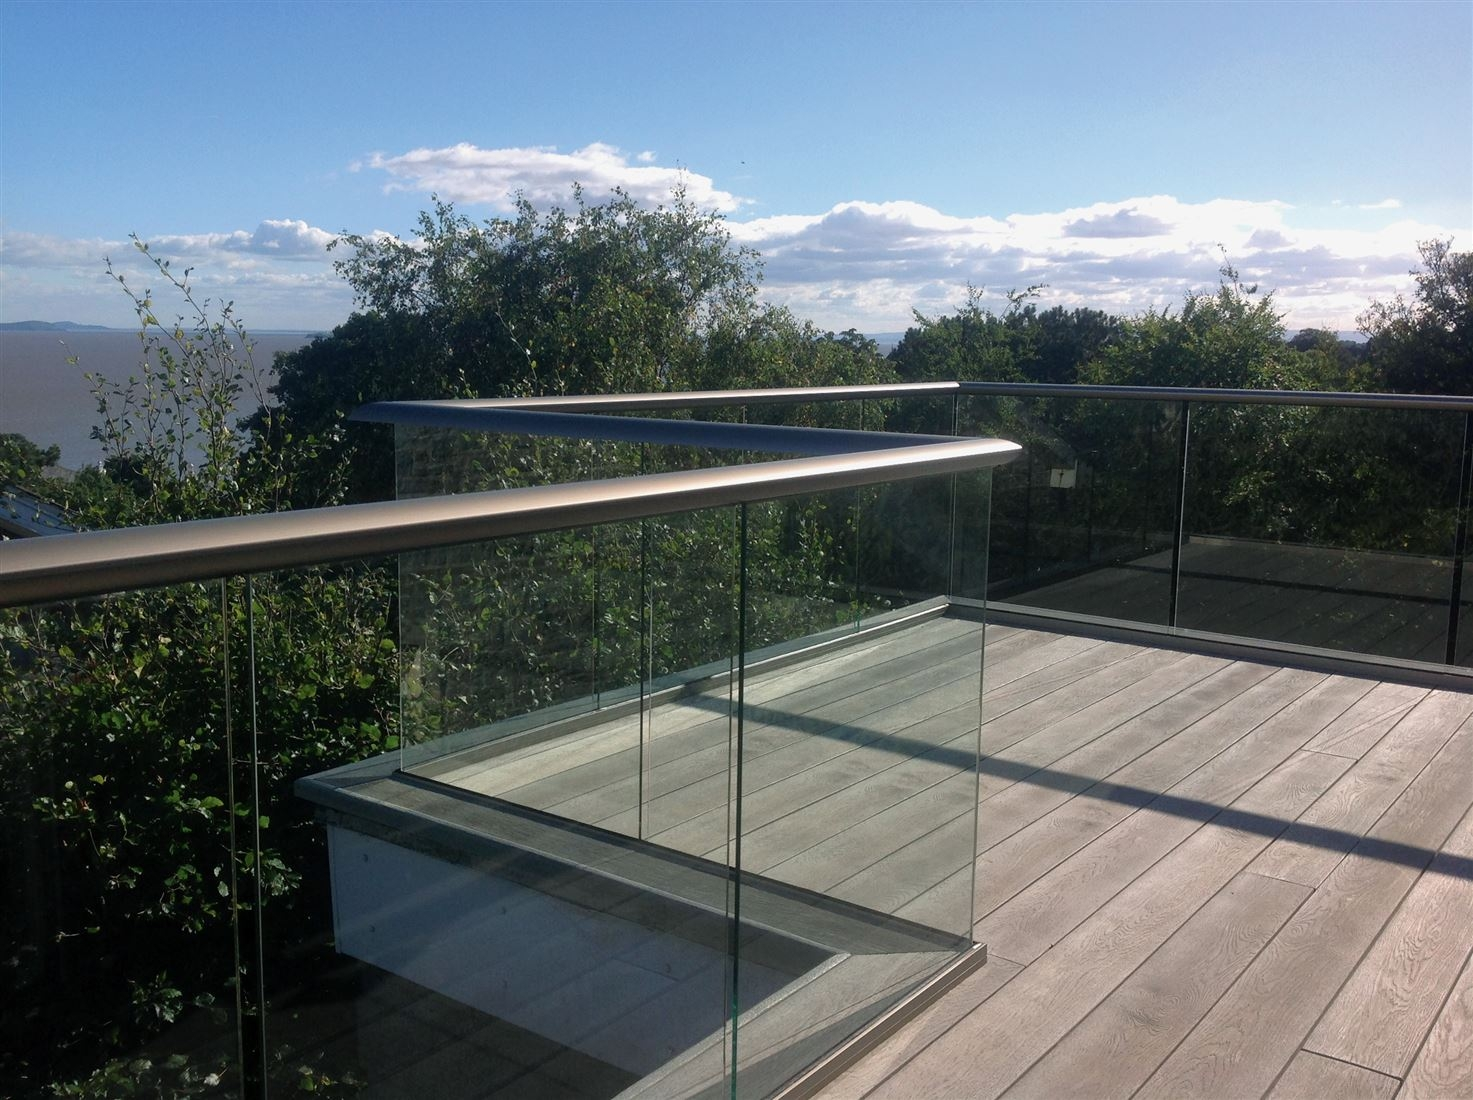 glass balustrade on decks